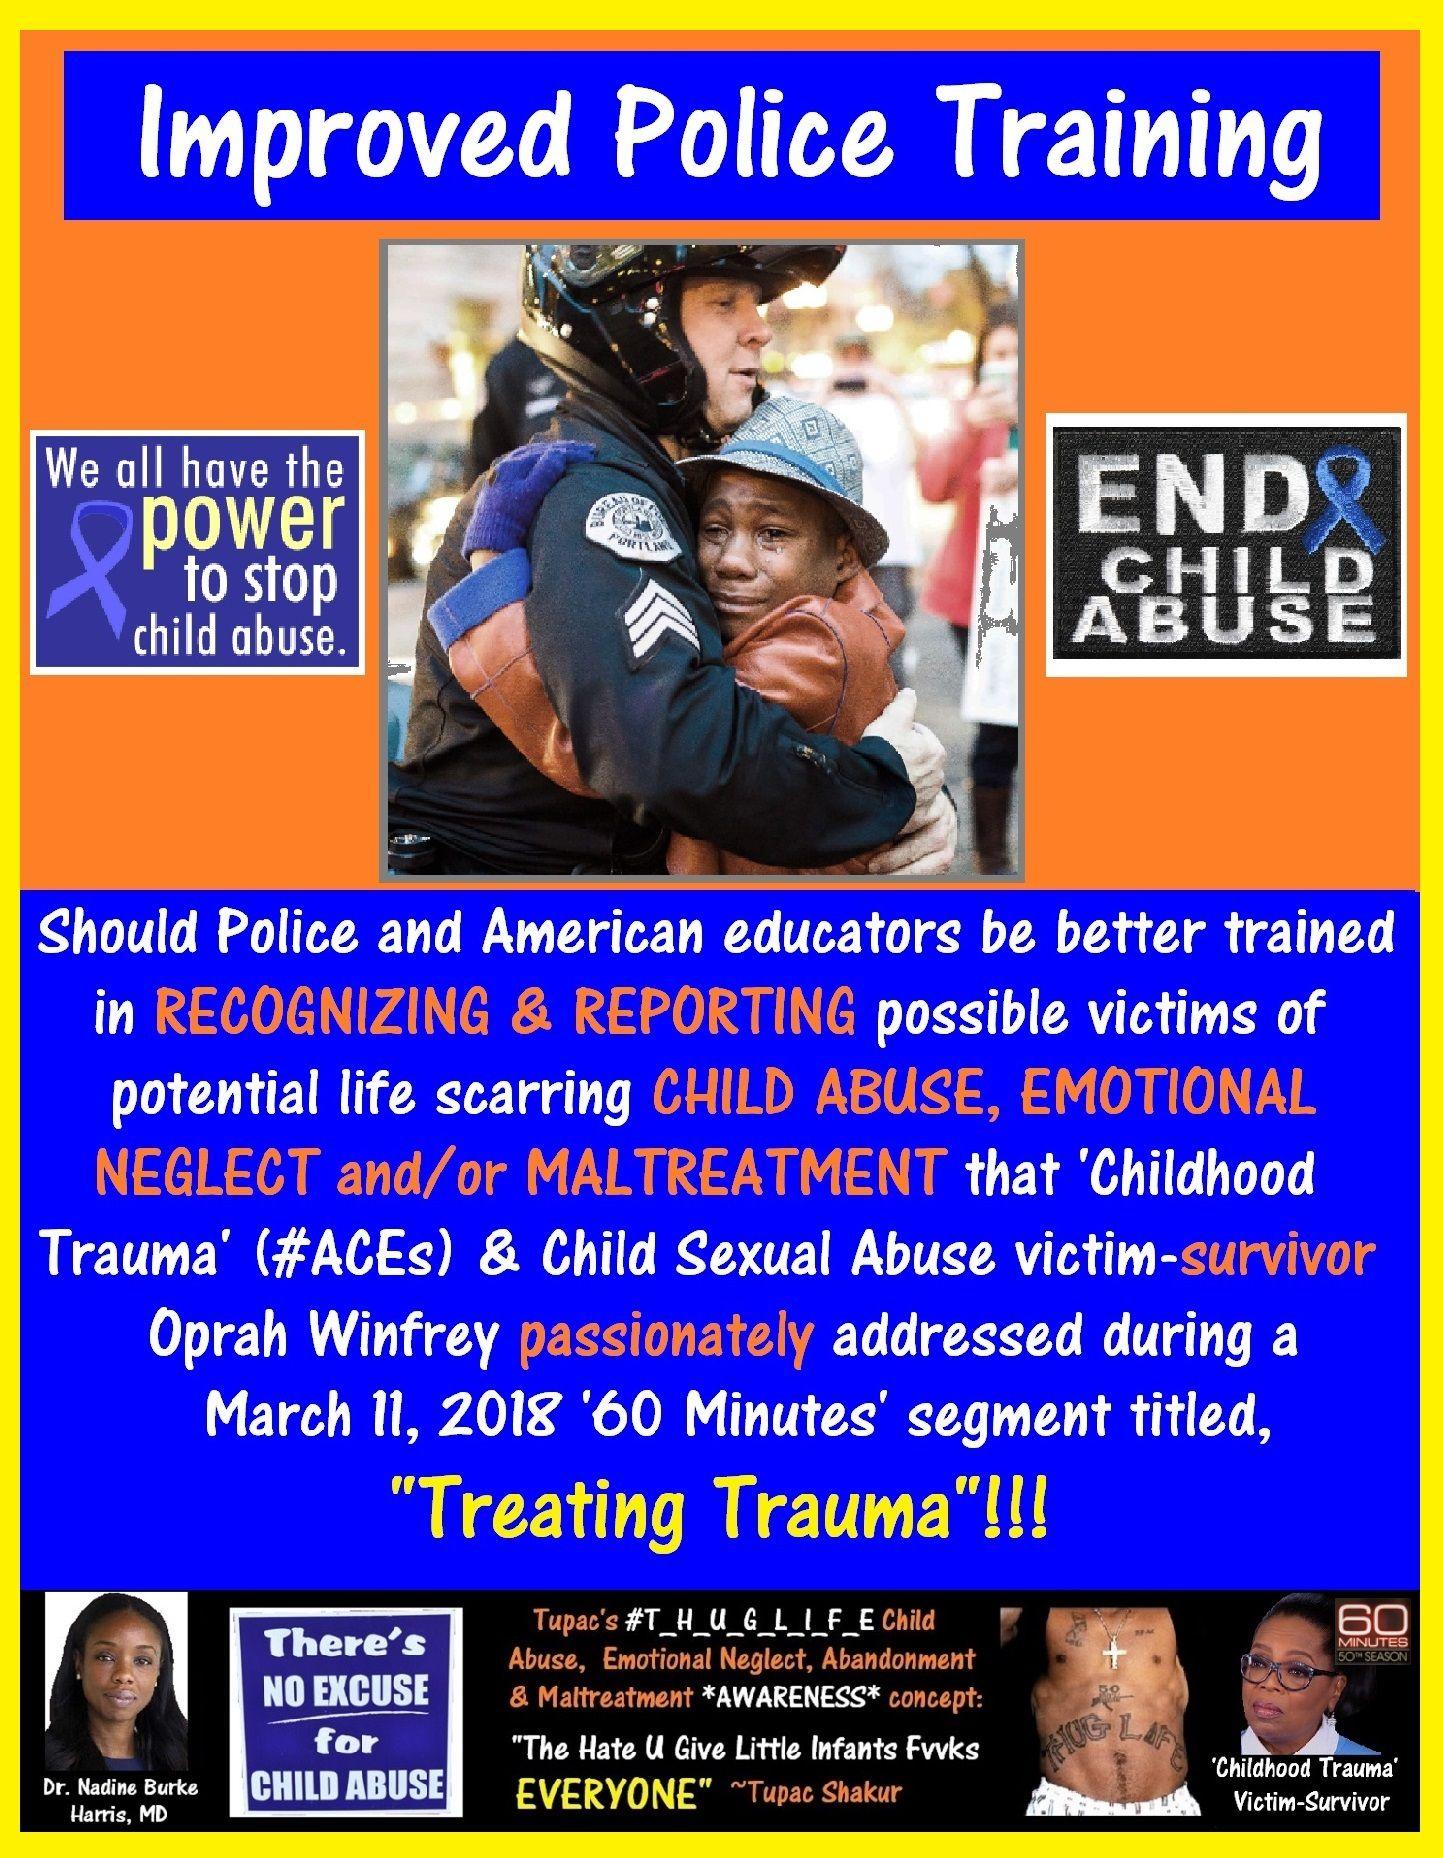 POLICE EDUCATOR TRAINING CHILD ABUSE.jpg